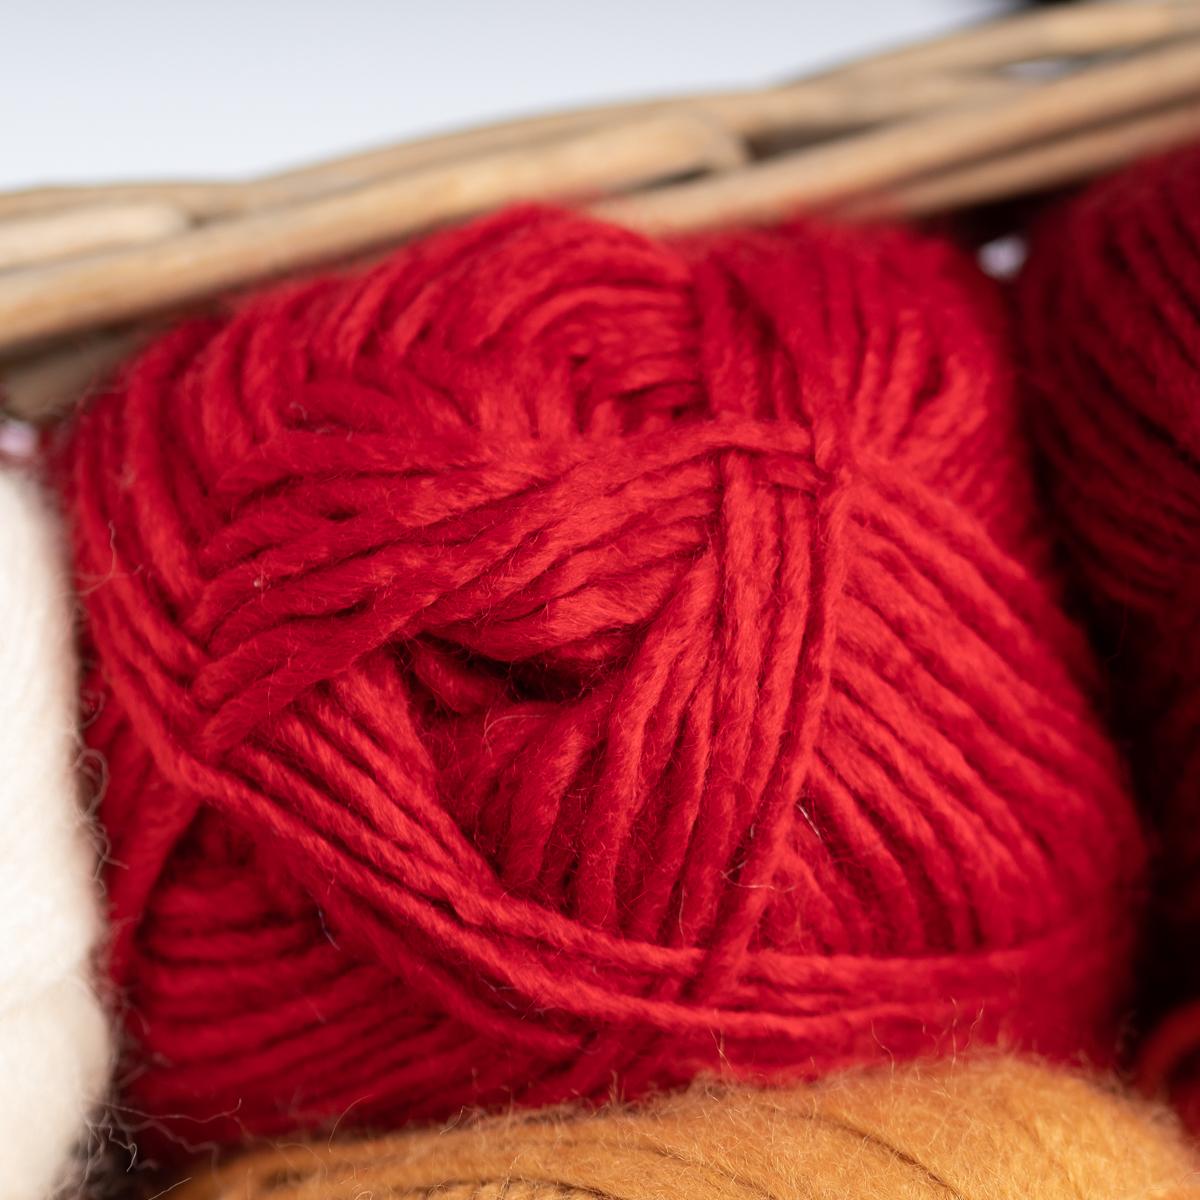 3pk-Lion-Brand-New-Basic-Acrylic-amp-Wool-Yarn-Medium-4-Knit-Crochet-Skeins-Soft thumbnail 90